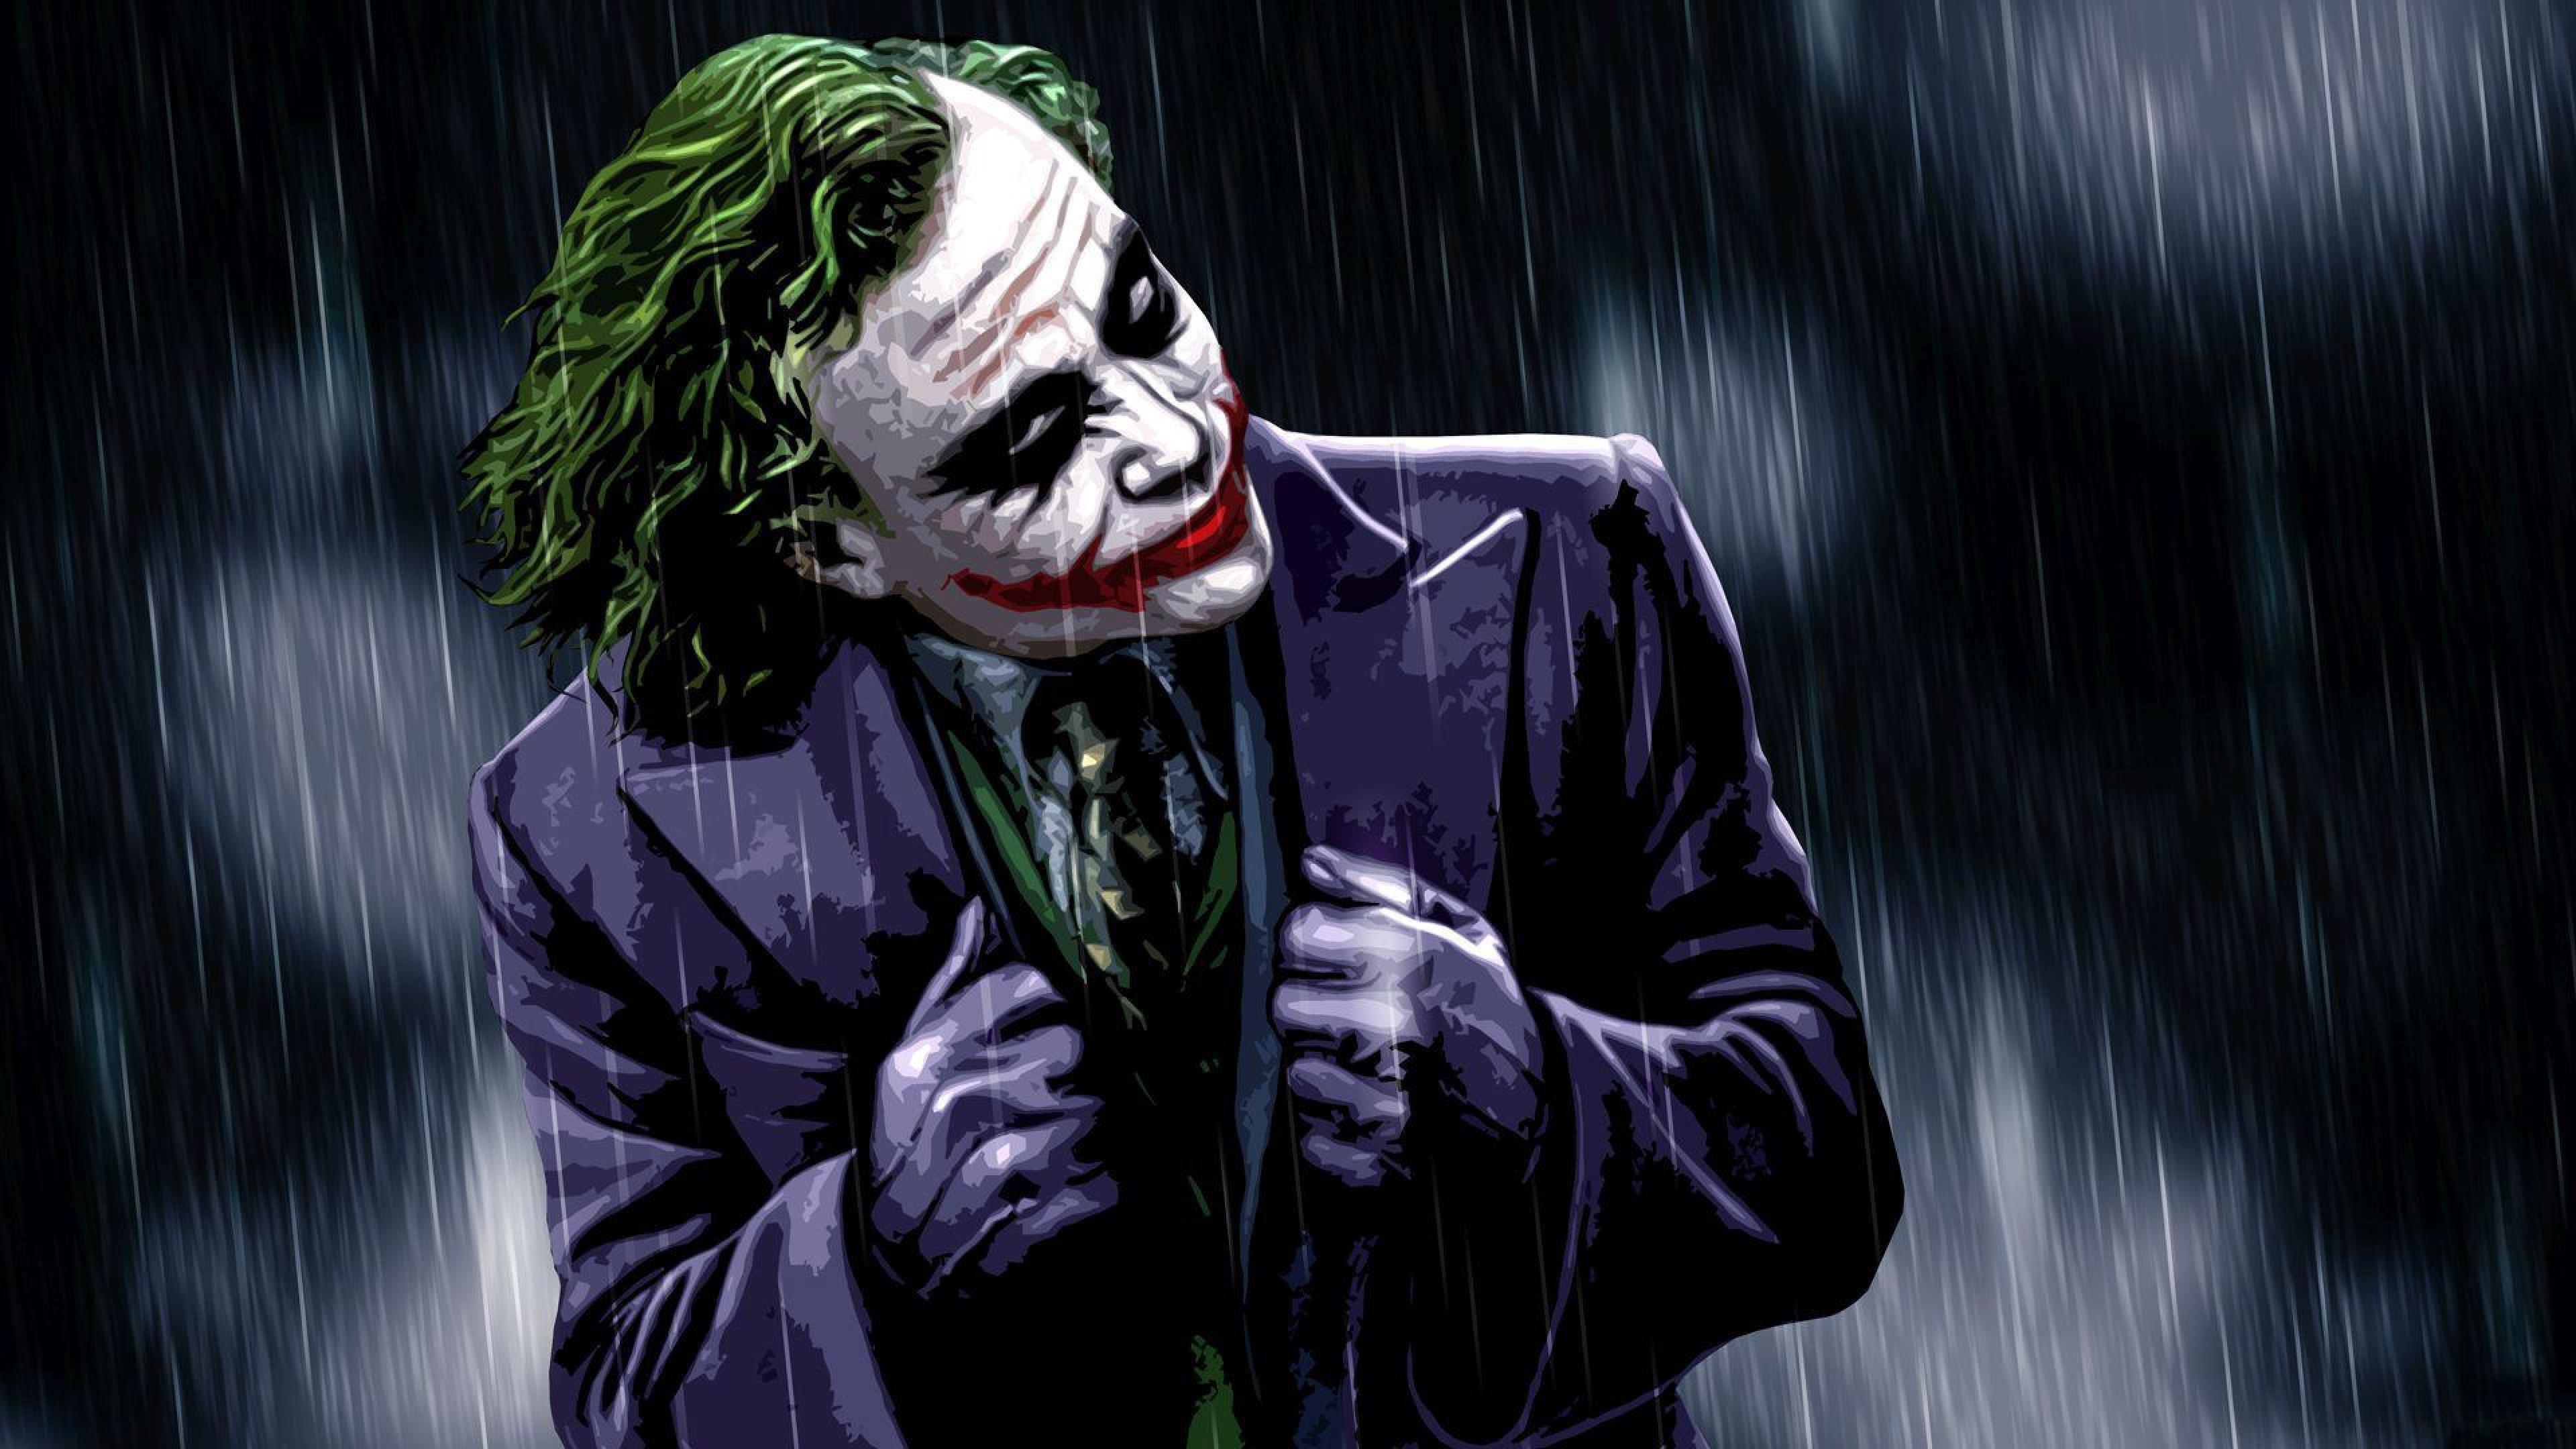 The Joker Desktop Background ???' WallpaperTag